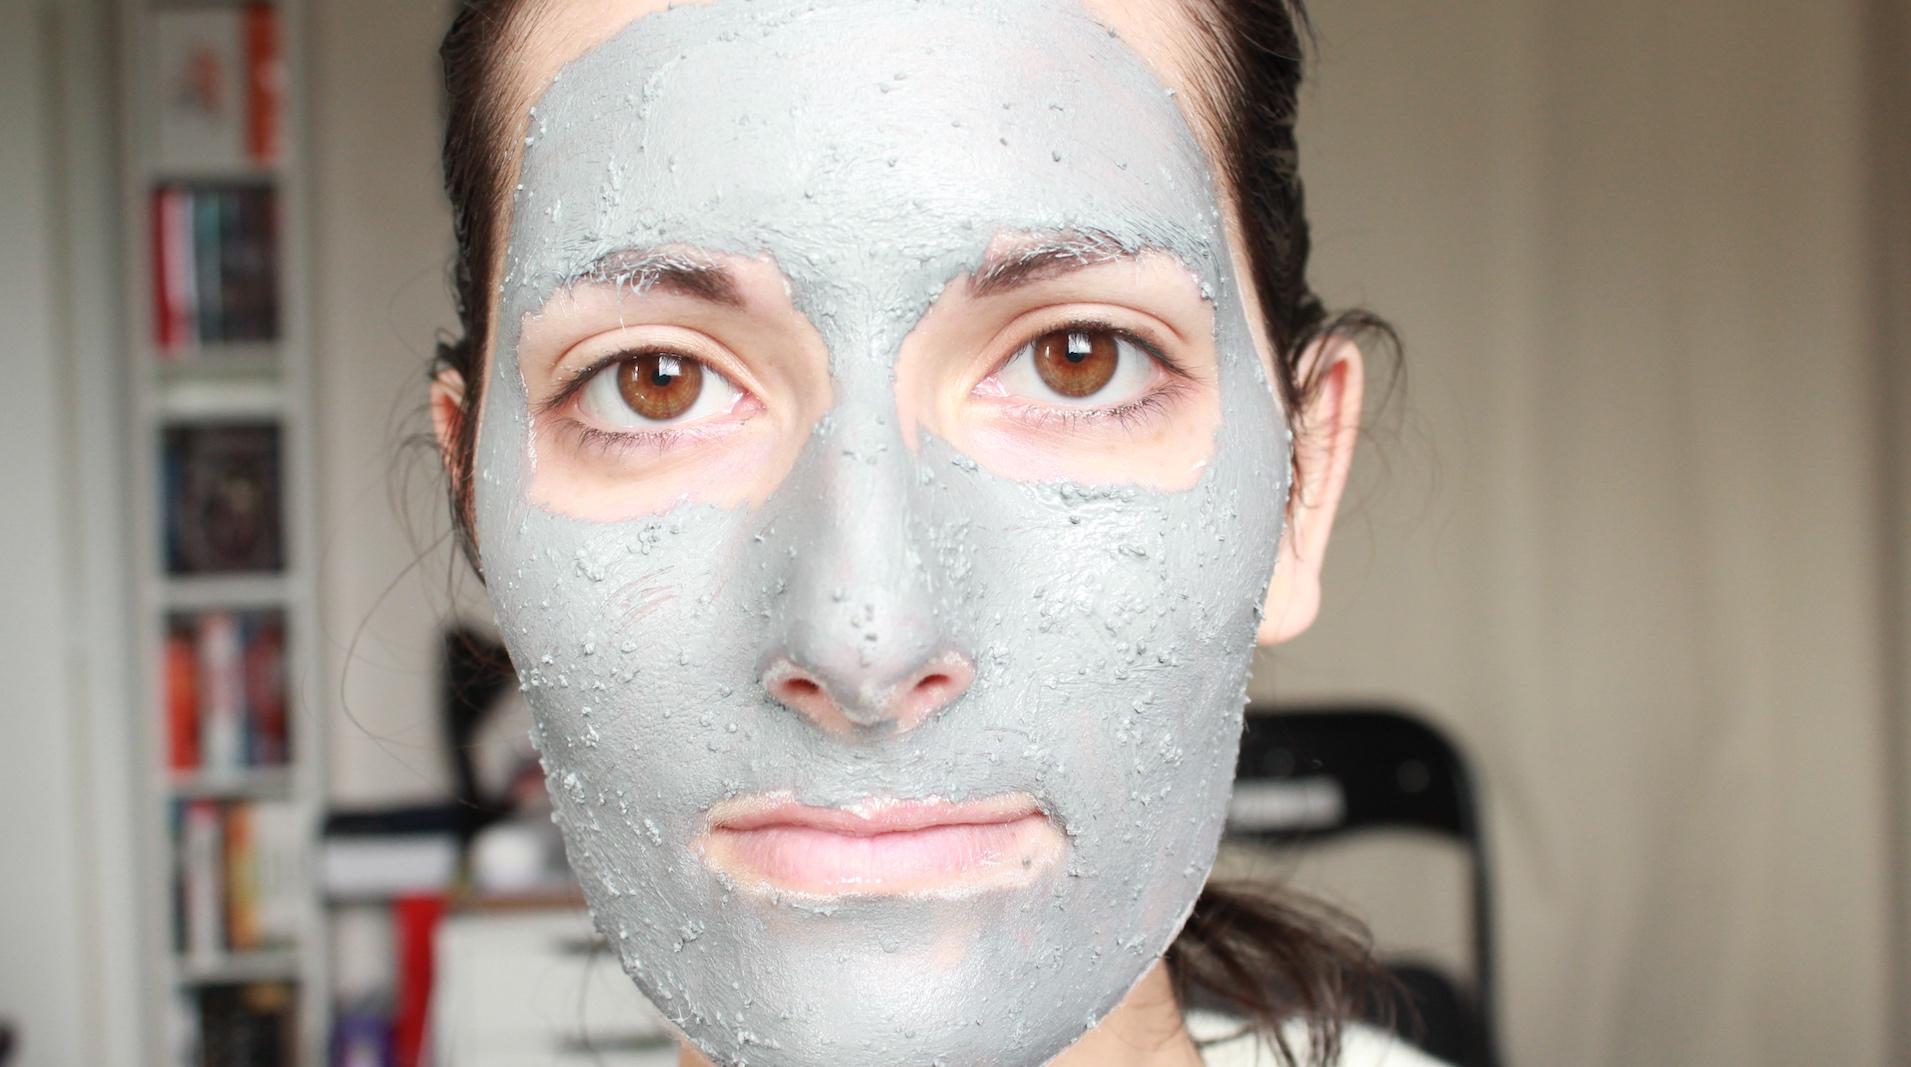 masque boue de sephora 8